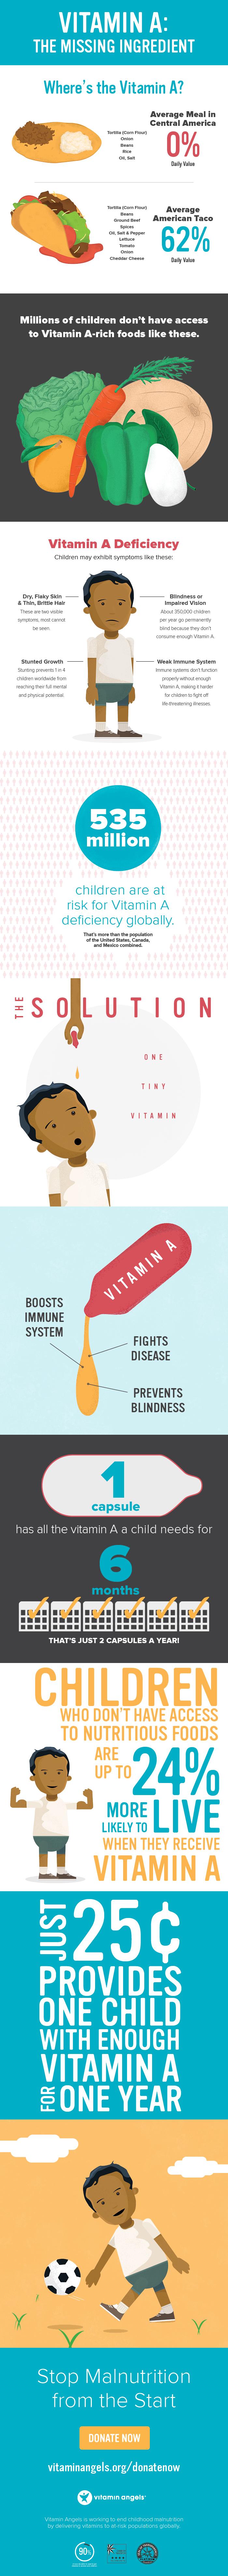 VitaminA-Infographic.png